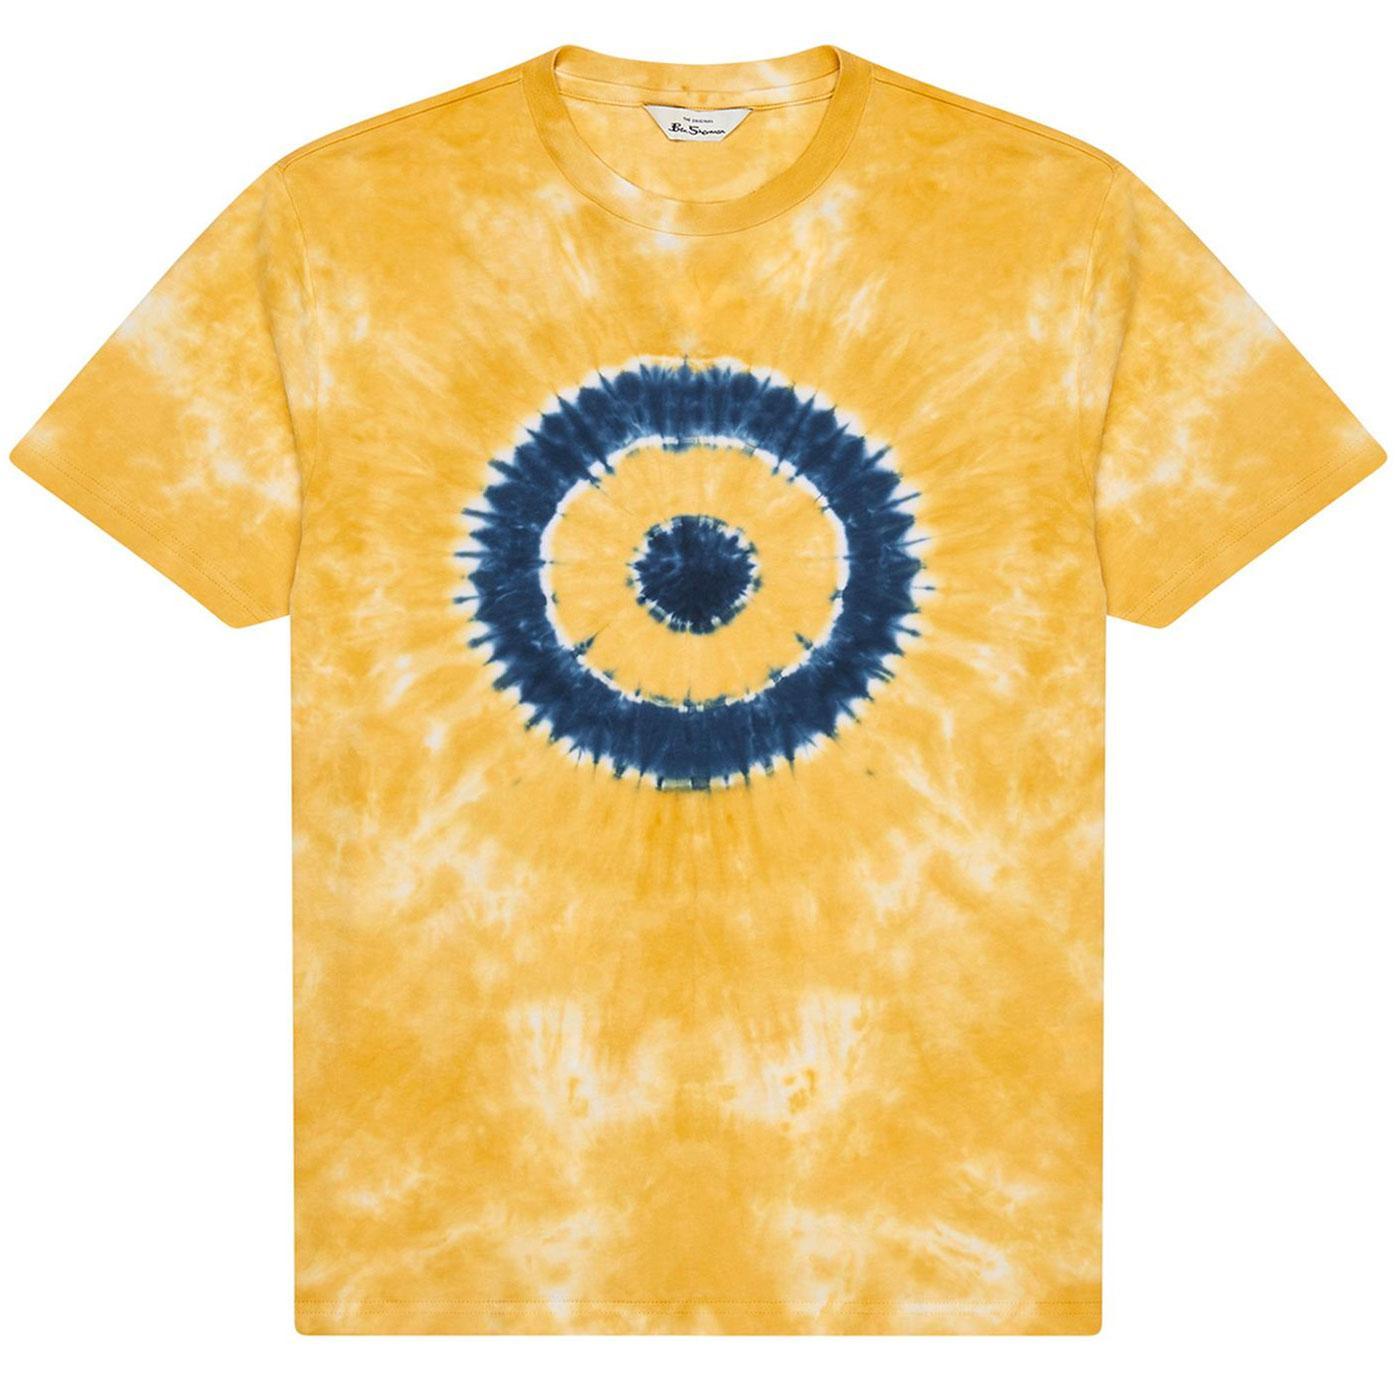 BEN SHERMAN Retro Tie Dye Mod Target Tee (Yellow)